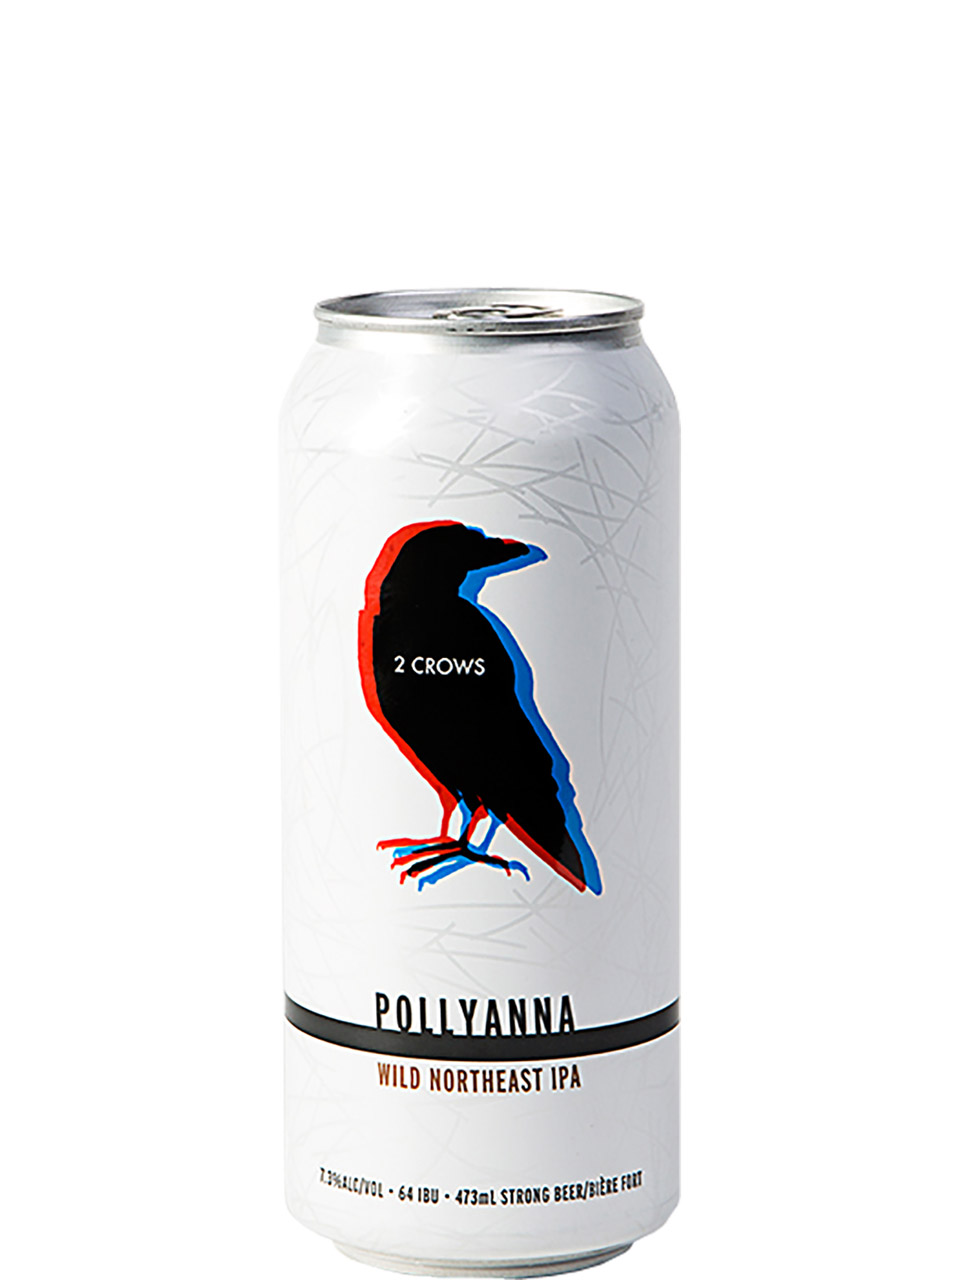 2 Crows Pollyanna Wild Northeast IPA 473ml Can